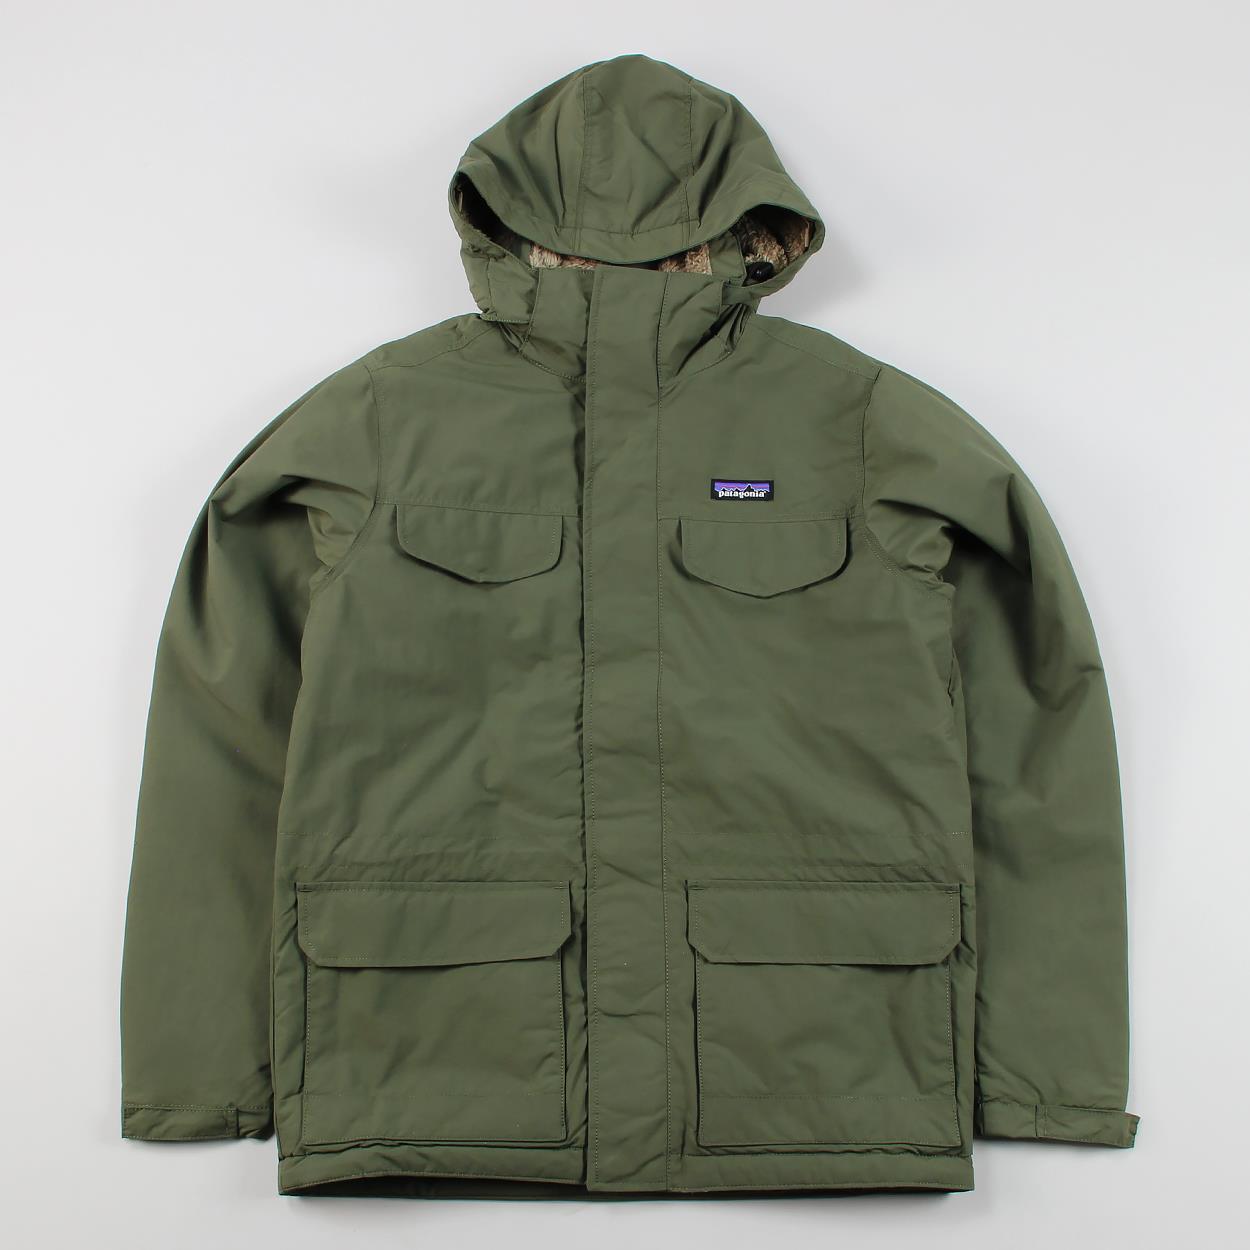 218f8f66f Patagonia Mens Outdoor Winter Waterproof Isthmus Parka Jacket Industrial  Green | eBay